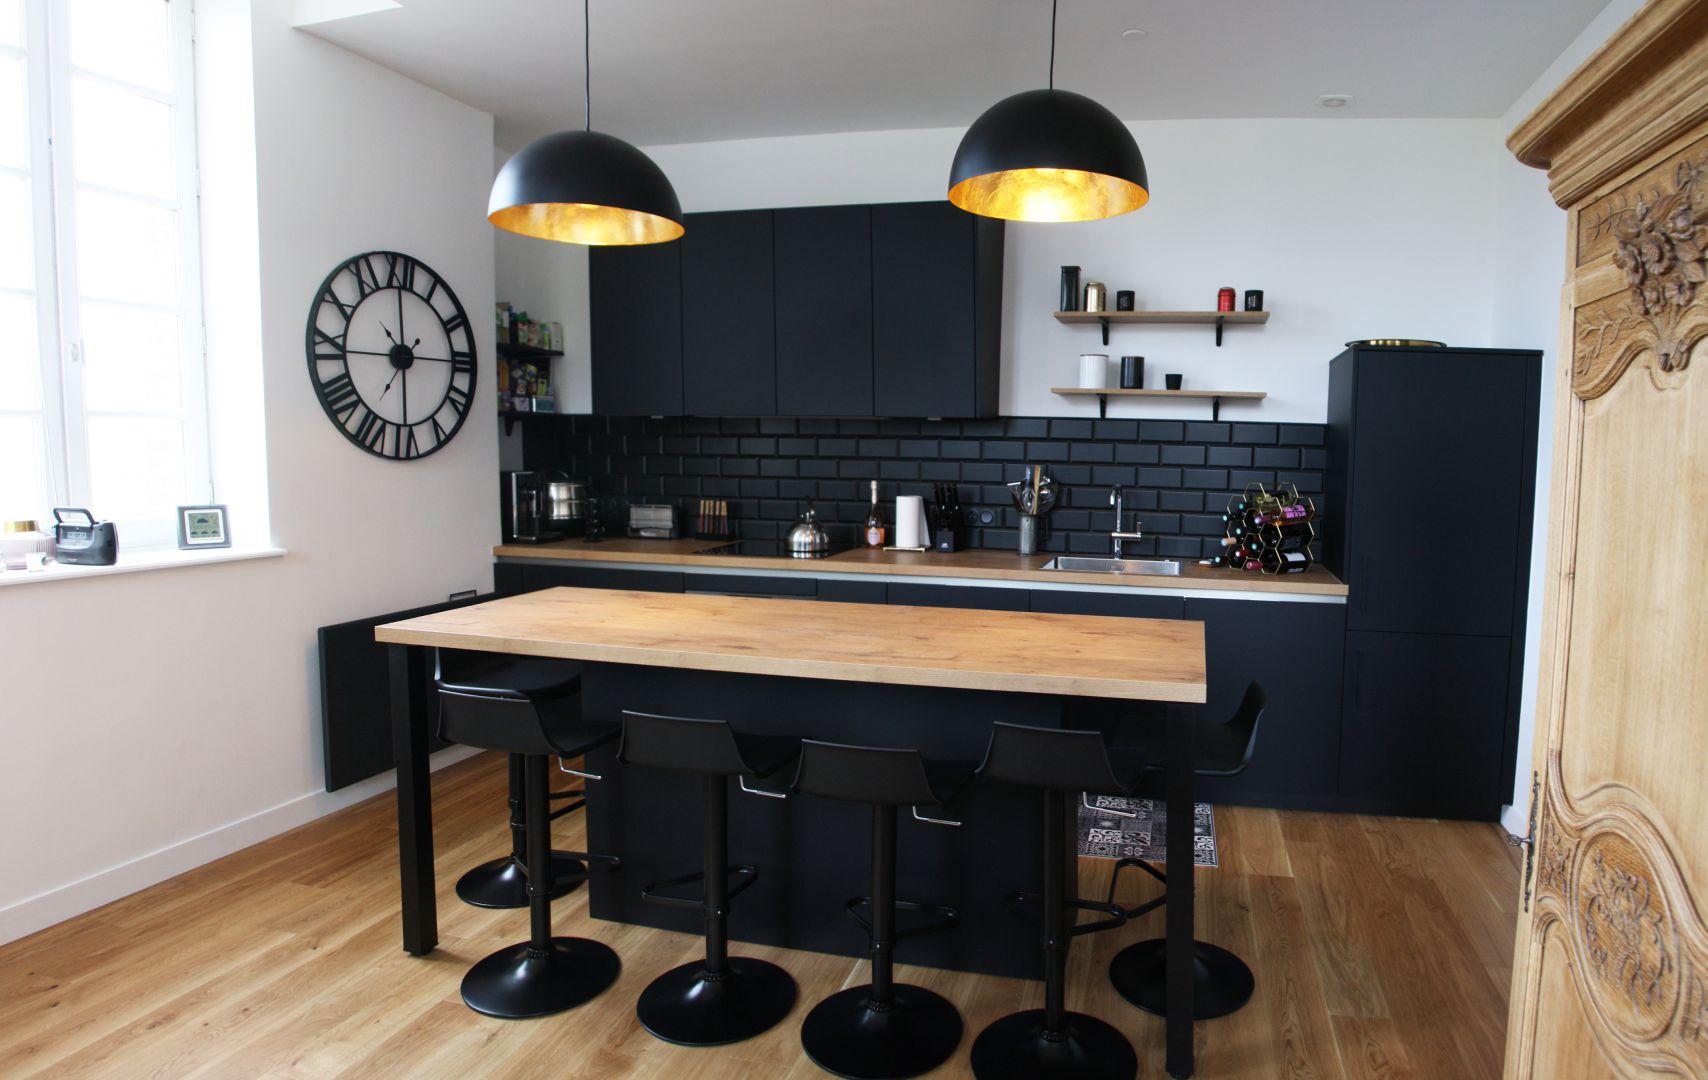 cuisine - moderne - noir - bois - luminaire - or - credence - pave - metro - mat - industriel - horloge